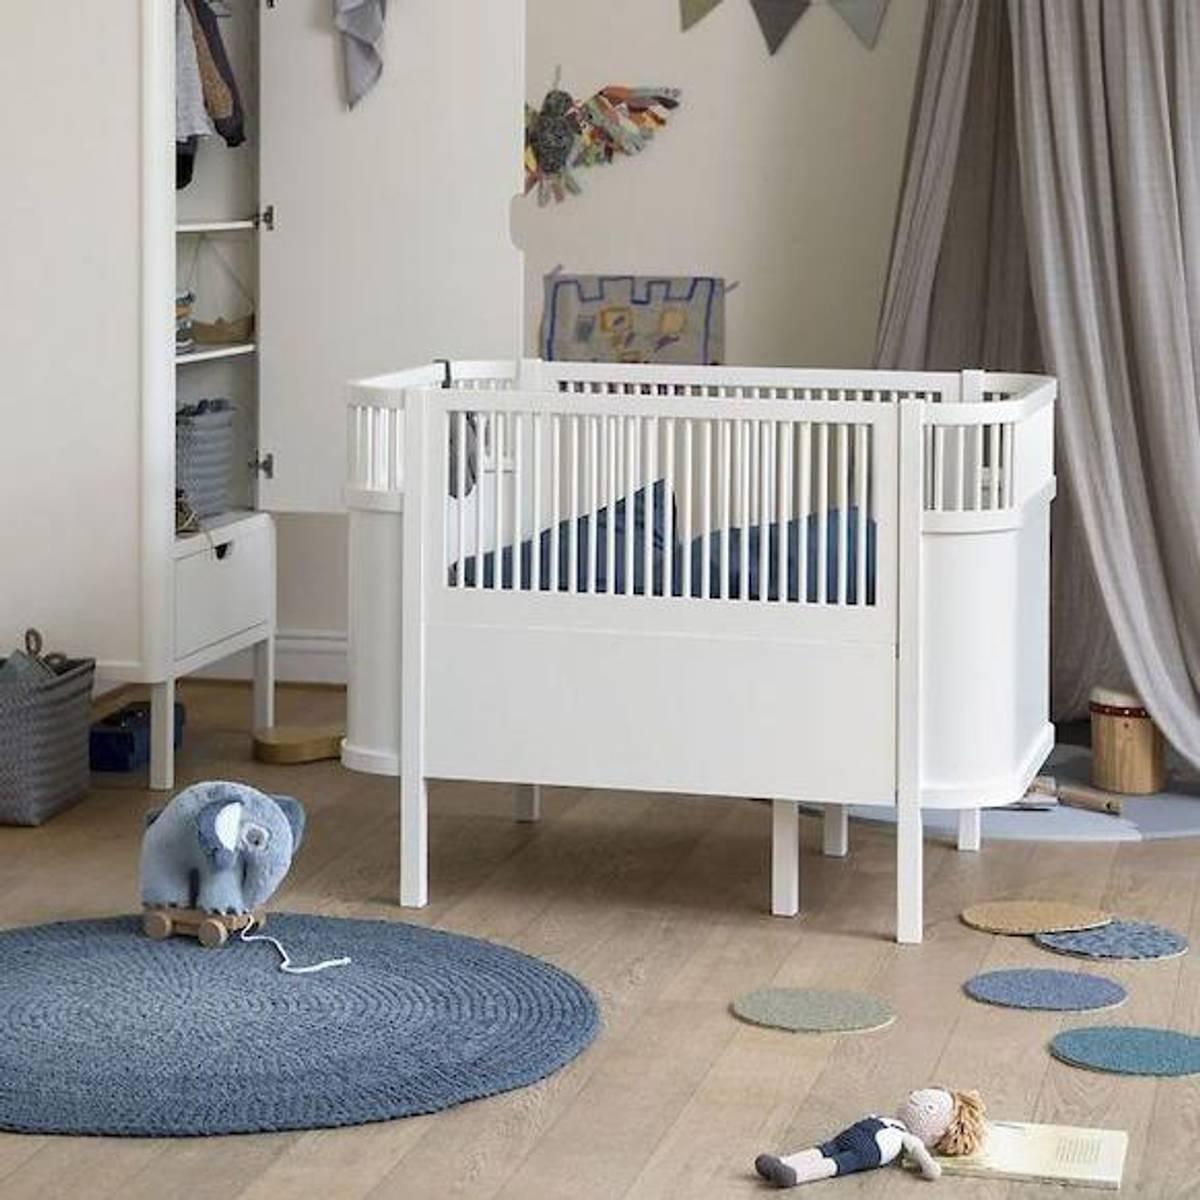 Sebra seng Baby & classic White